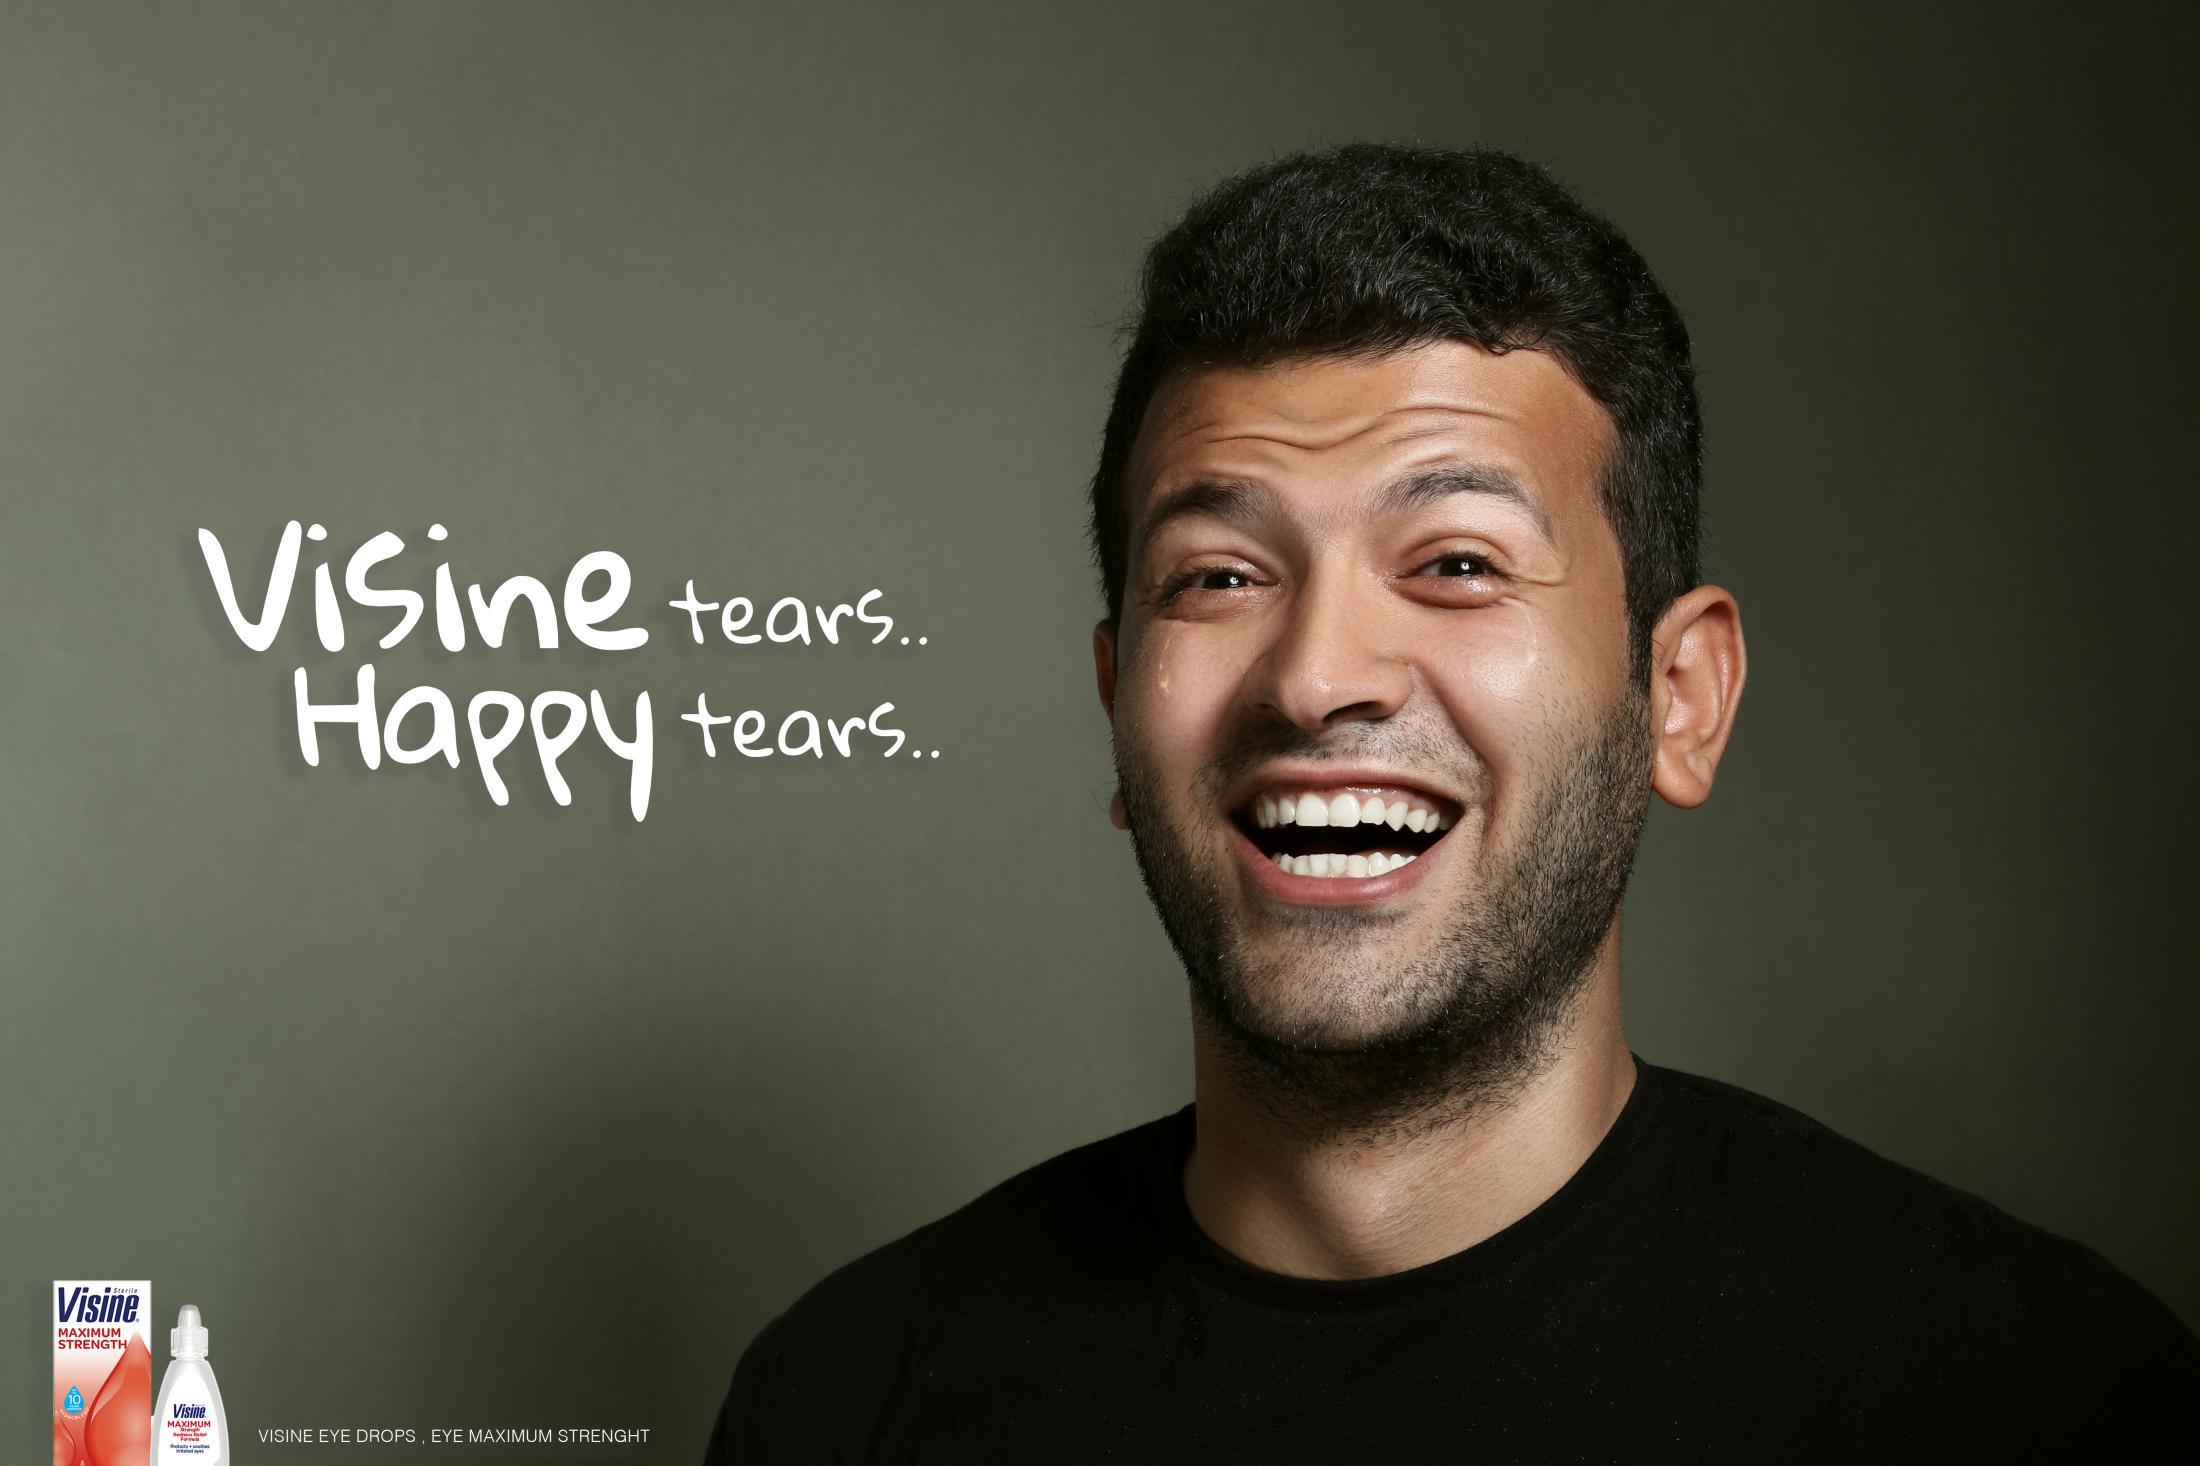 Visine Print Ad - Happy Tears - Tarek